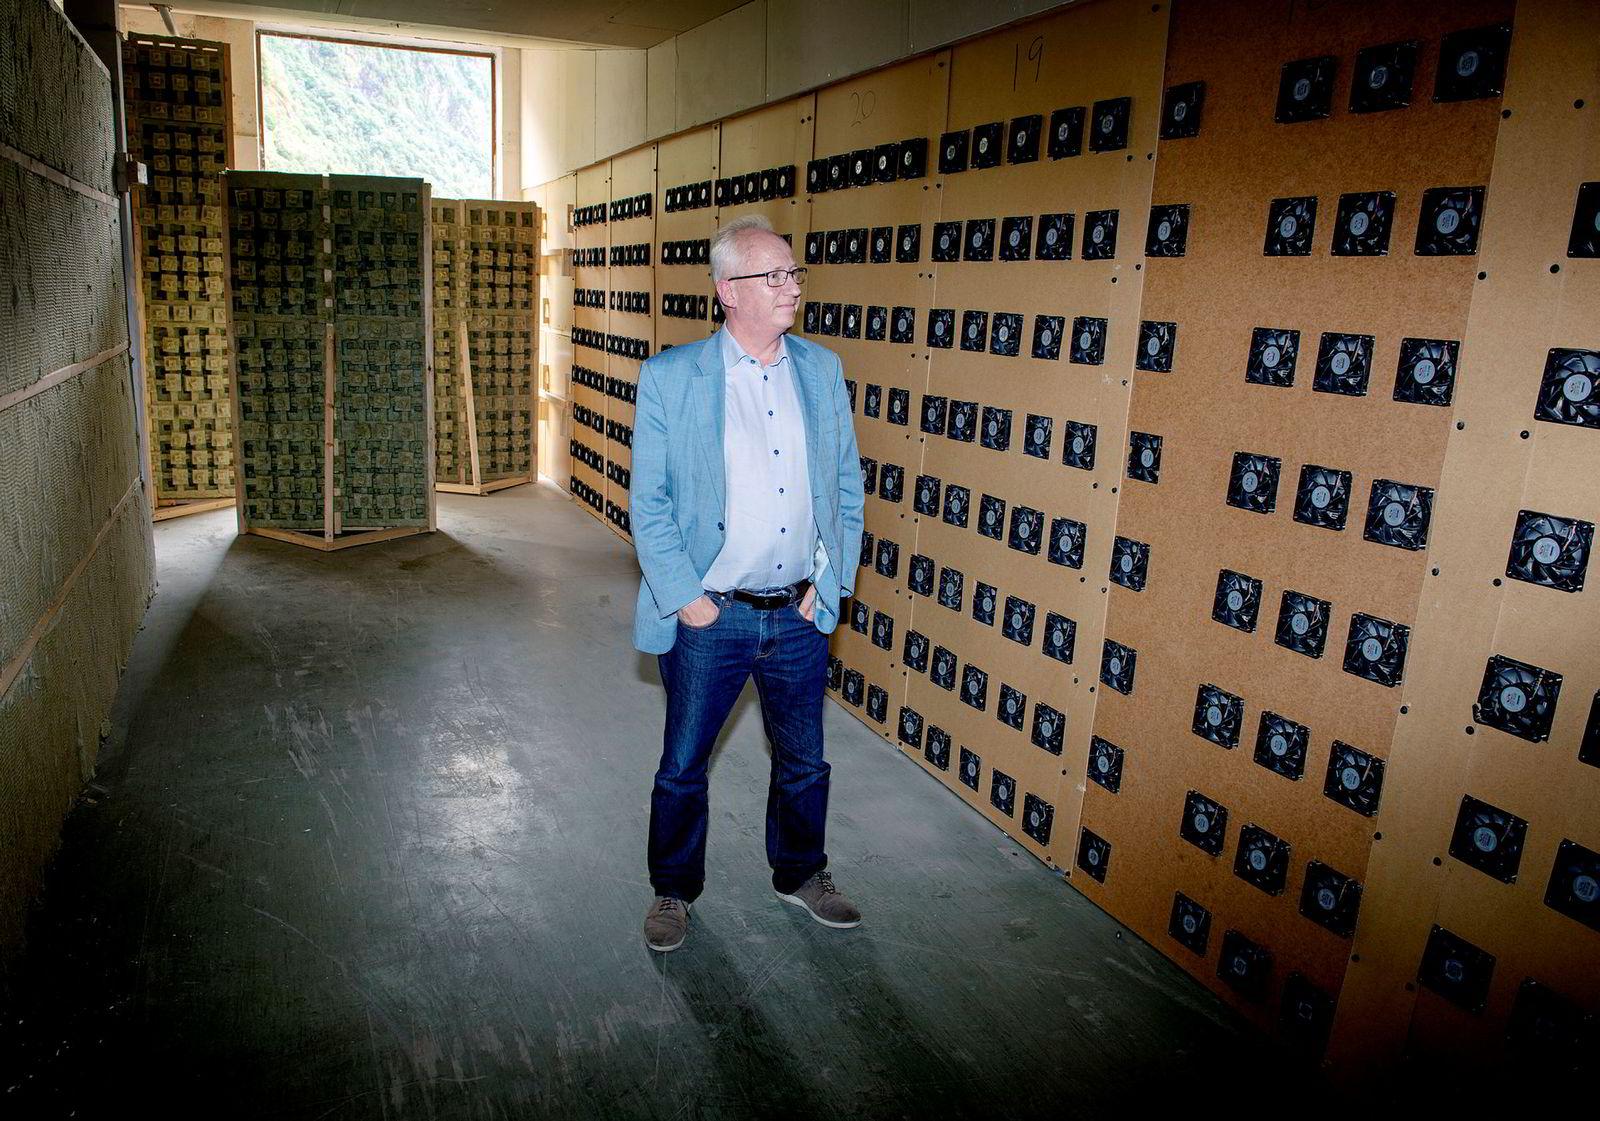 – Det er bedre at norsk strøm benyttes til datasentre i Norge enn til datasentre i Danmark, sier Gjermund Hagesæter, talsmann for Kryptovault.